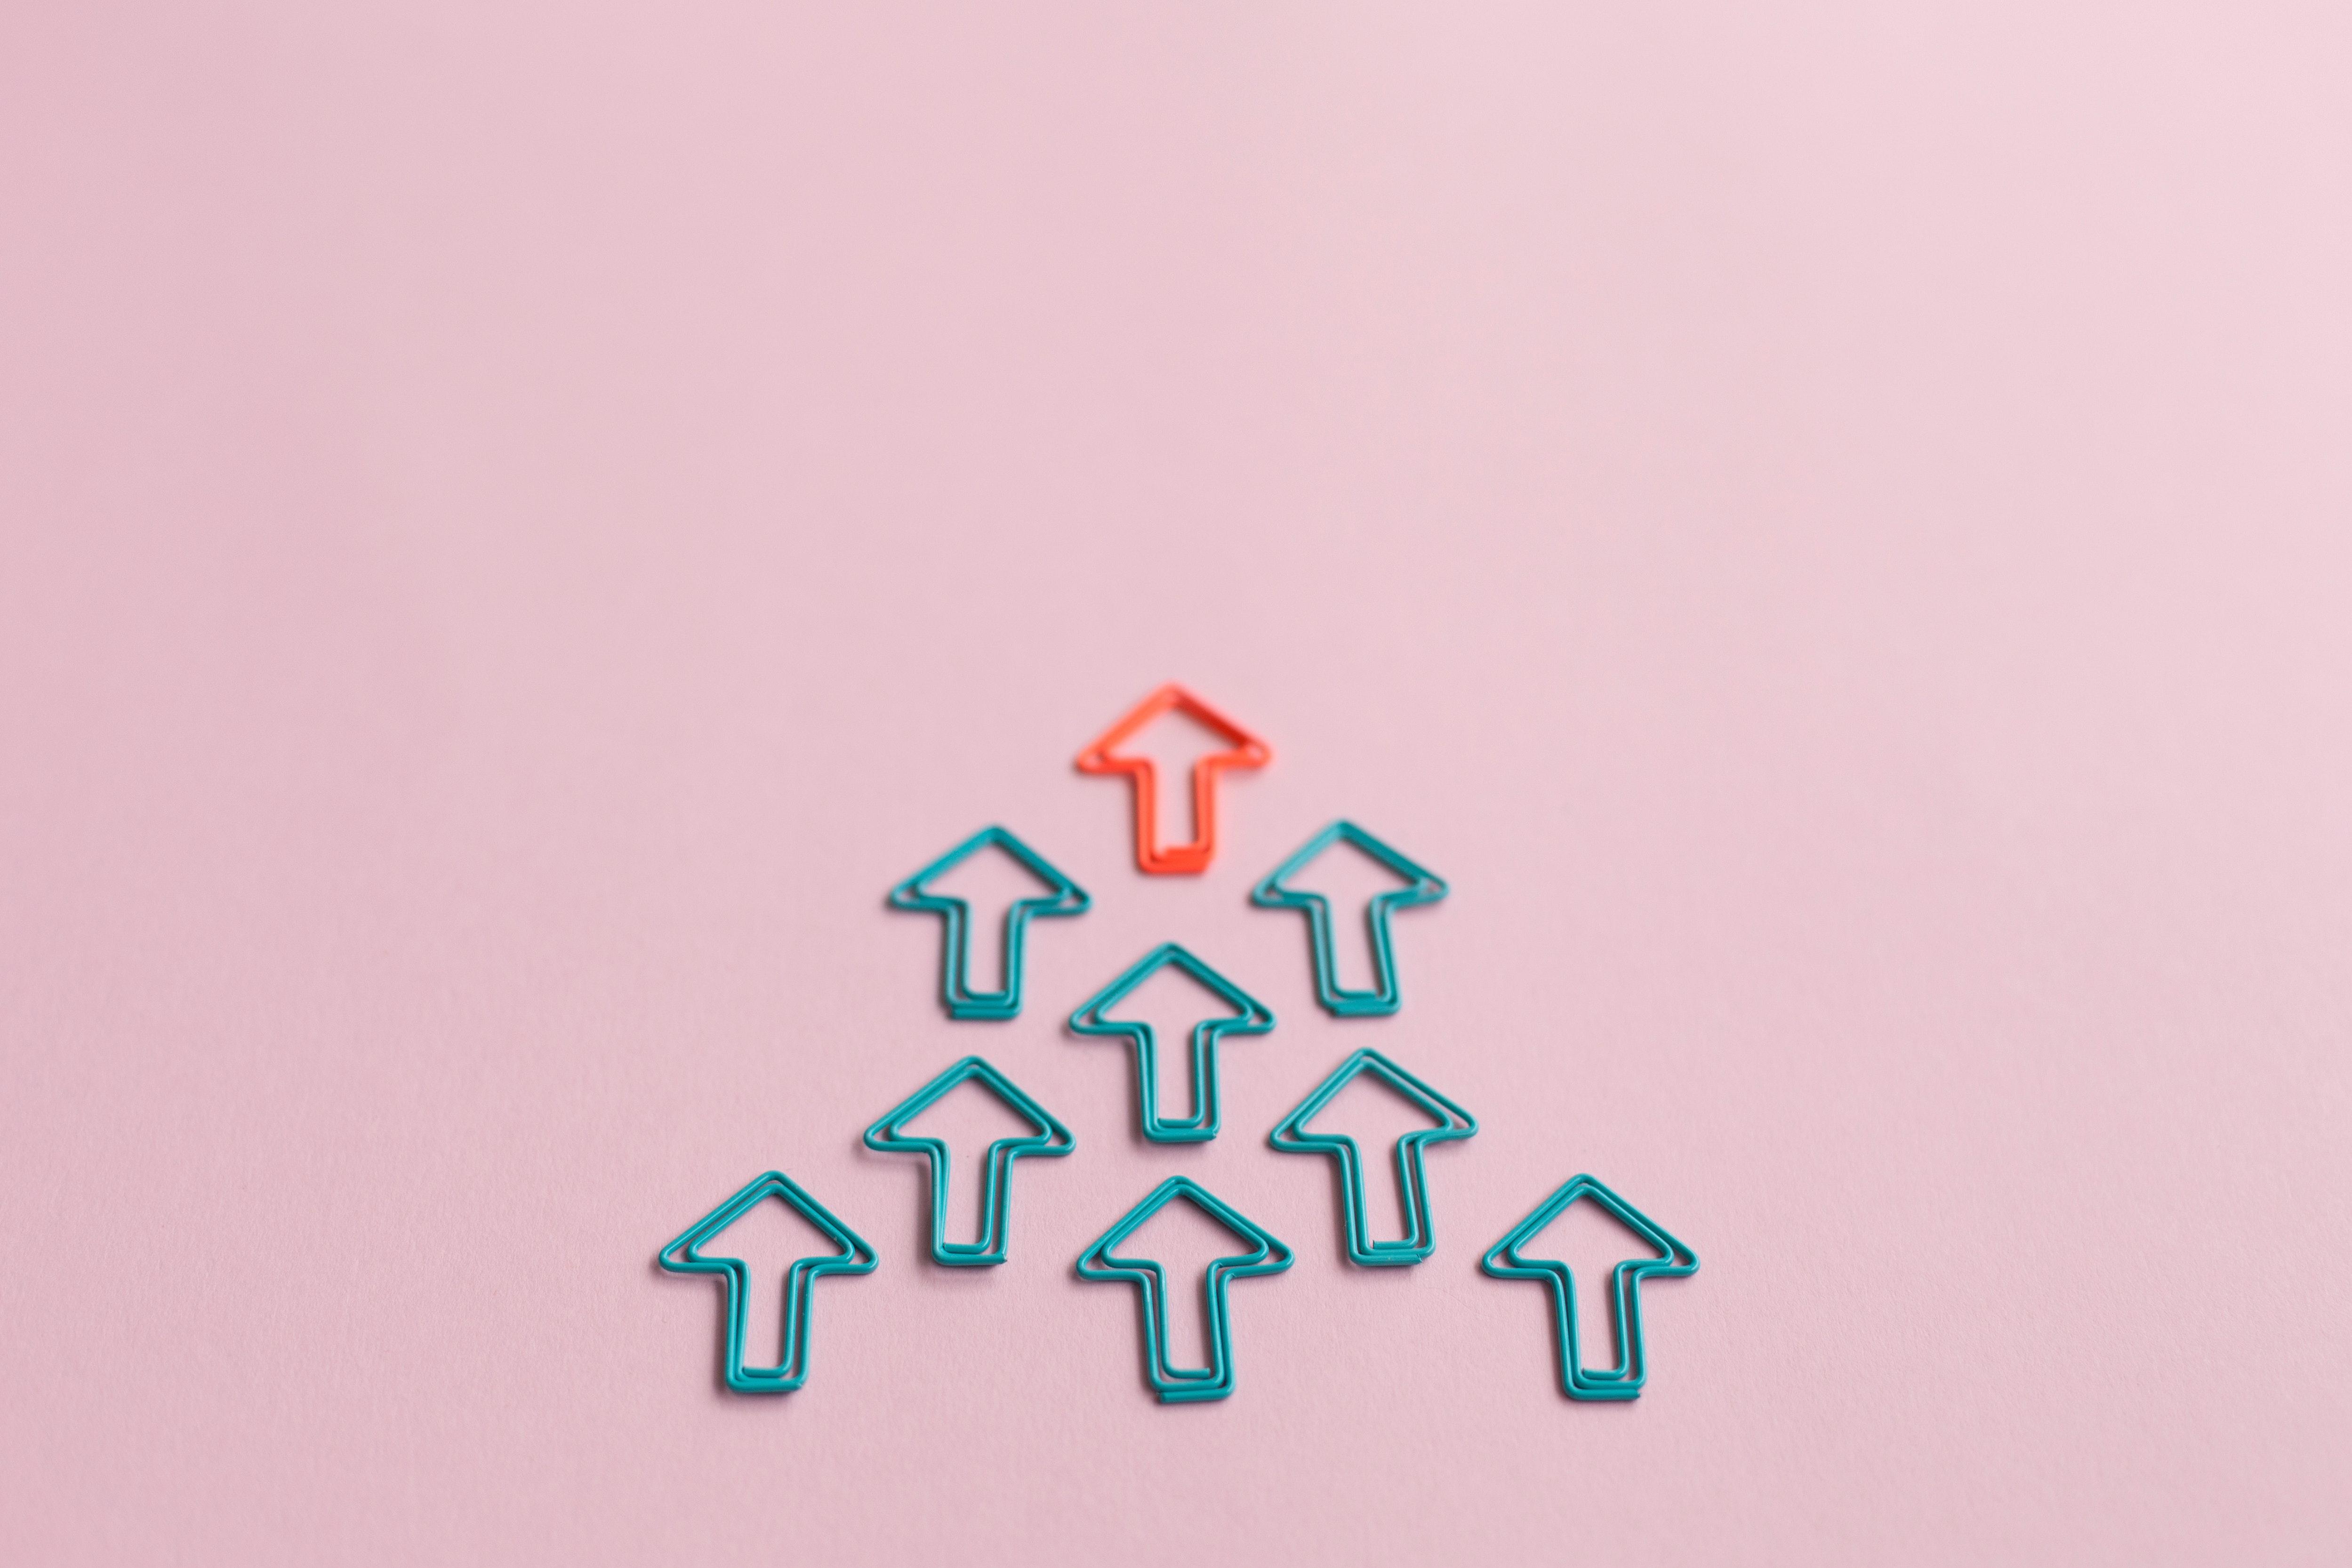 Pfeile Papier als Symbolbild fuer Forschungsmanagement